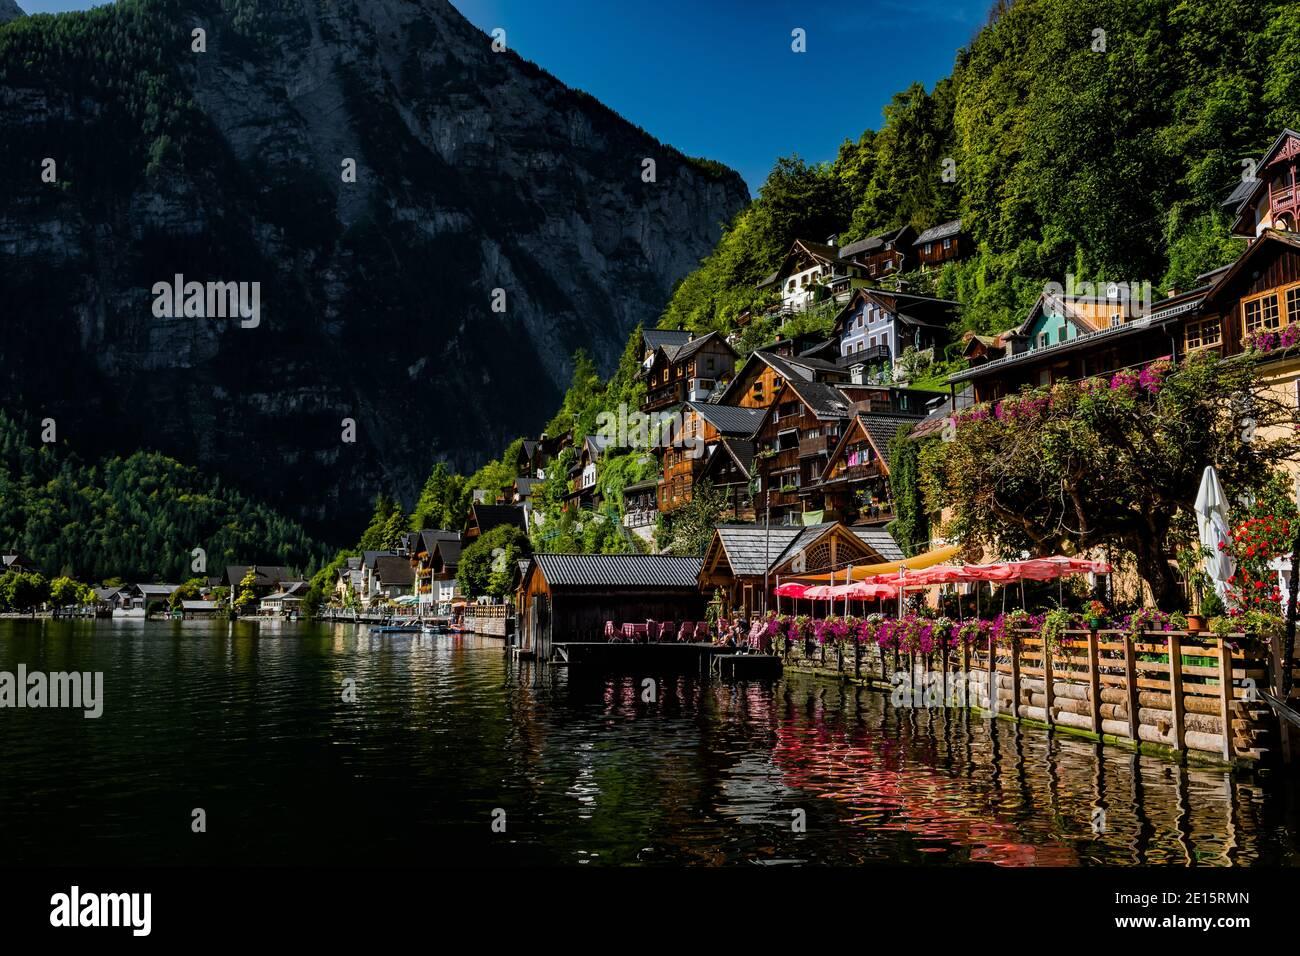 Picturesque Lakeside Town Hallstatt At Lake Hallstaetter See In Austria Stock Photo